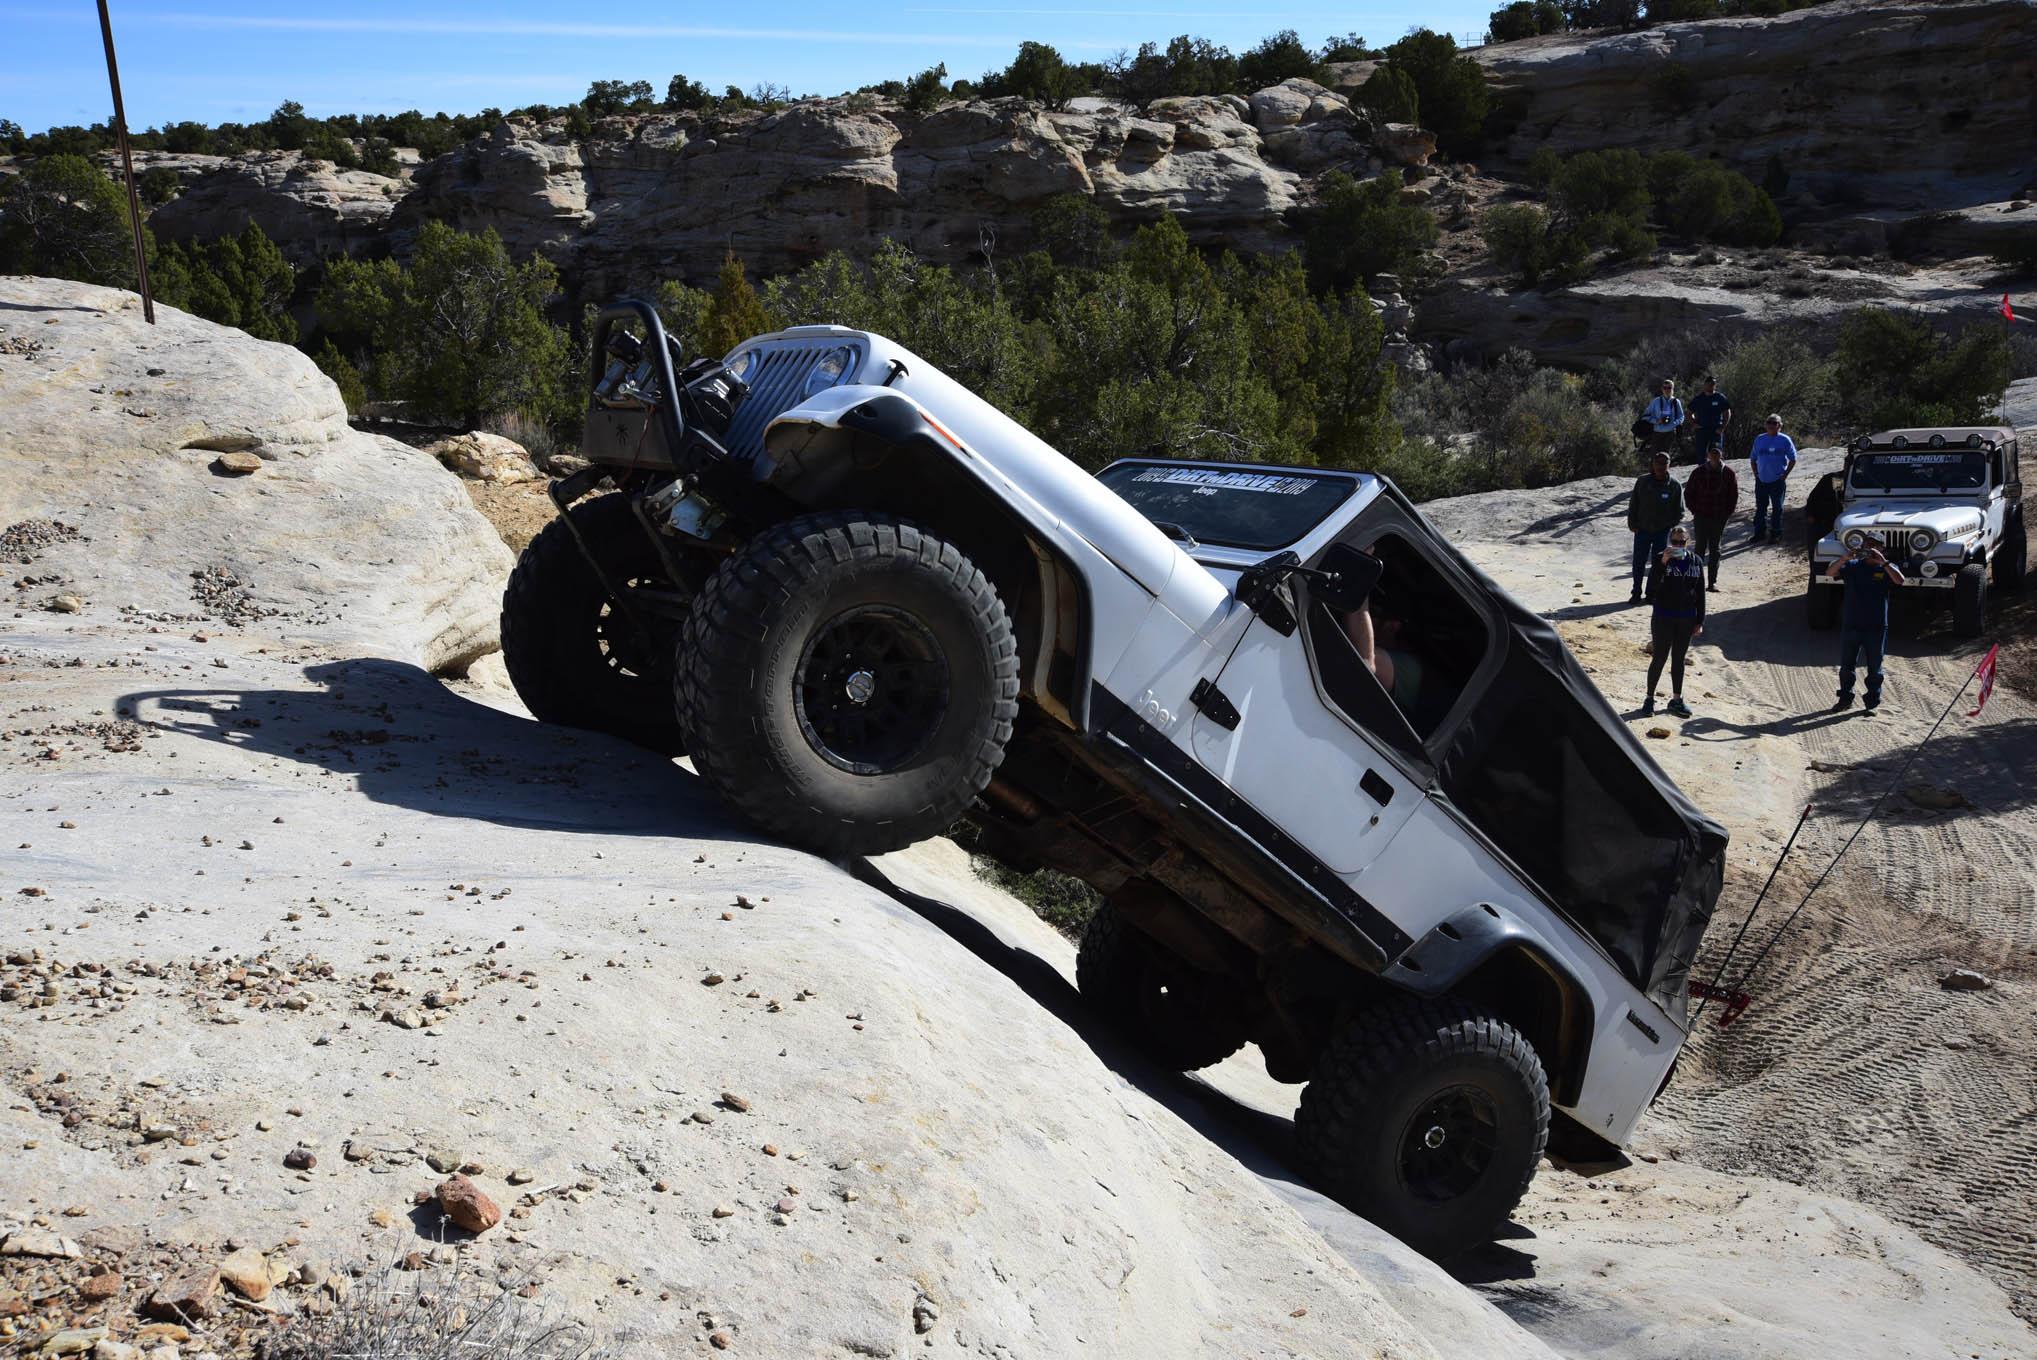 035 jeep 1984 scrambler cj8 cj 8 jp magazine stuart bourdon aaron paris